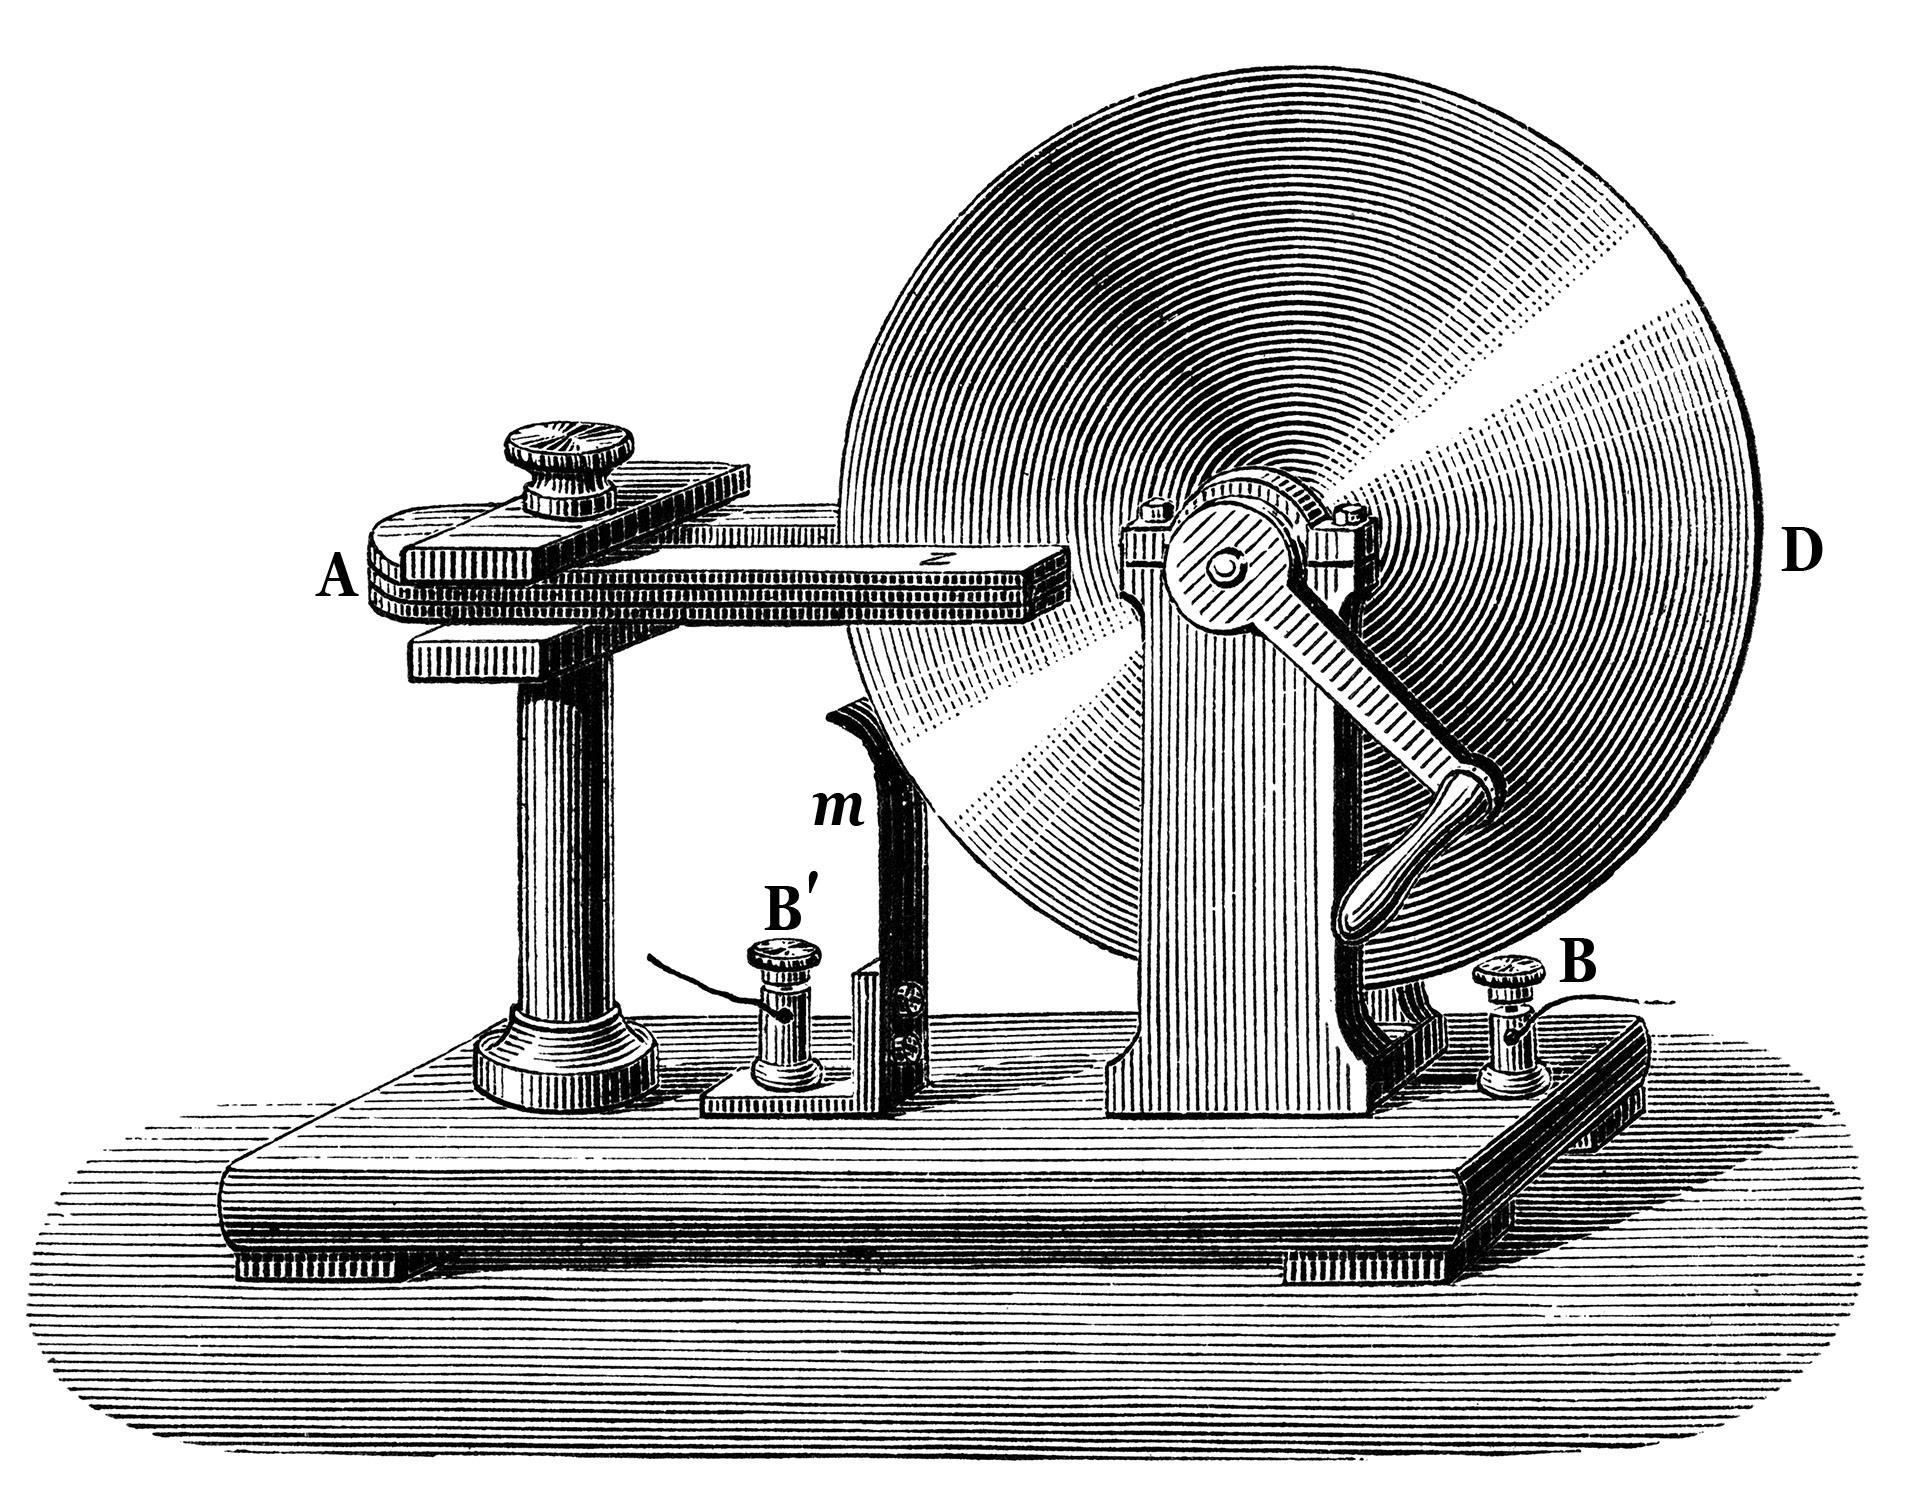 File:Faraday disk generator.jpg